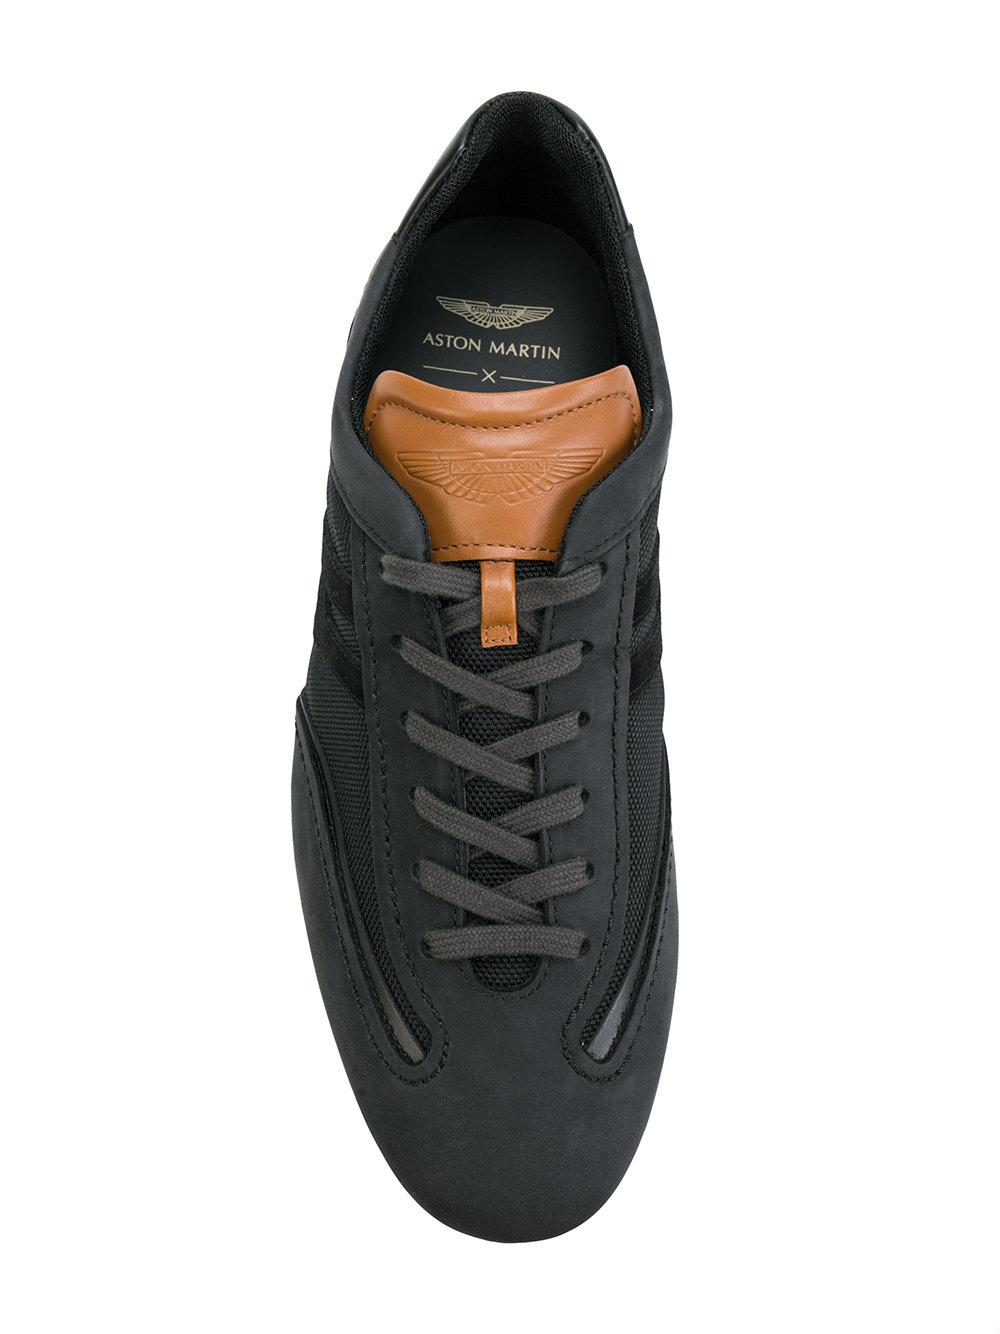 Hogan Sneakers Aston Martin X In Black For Men Lyst